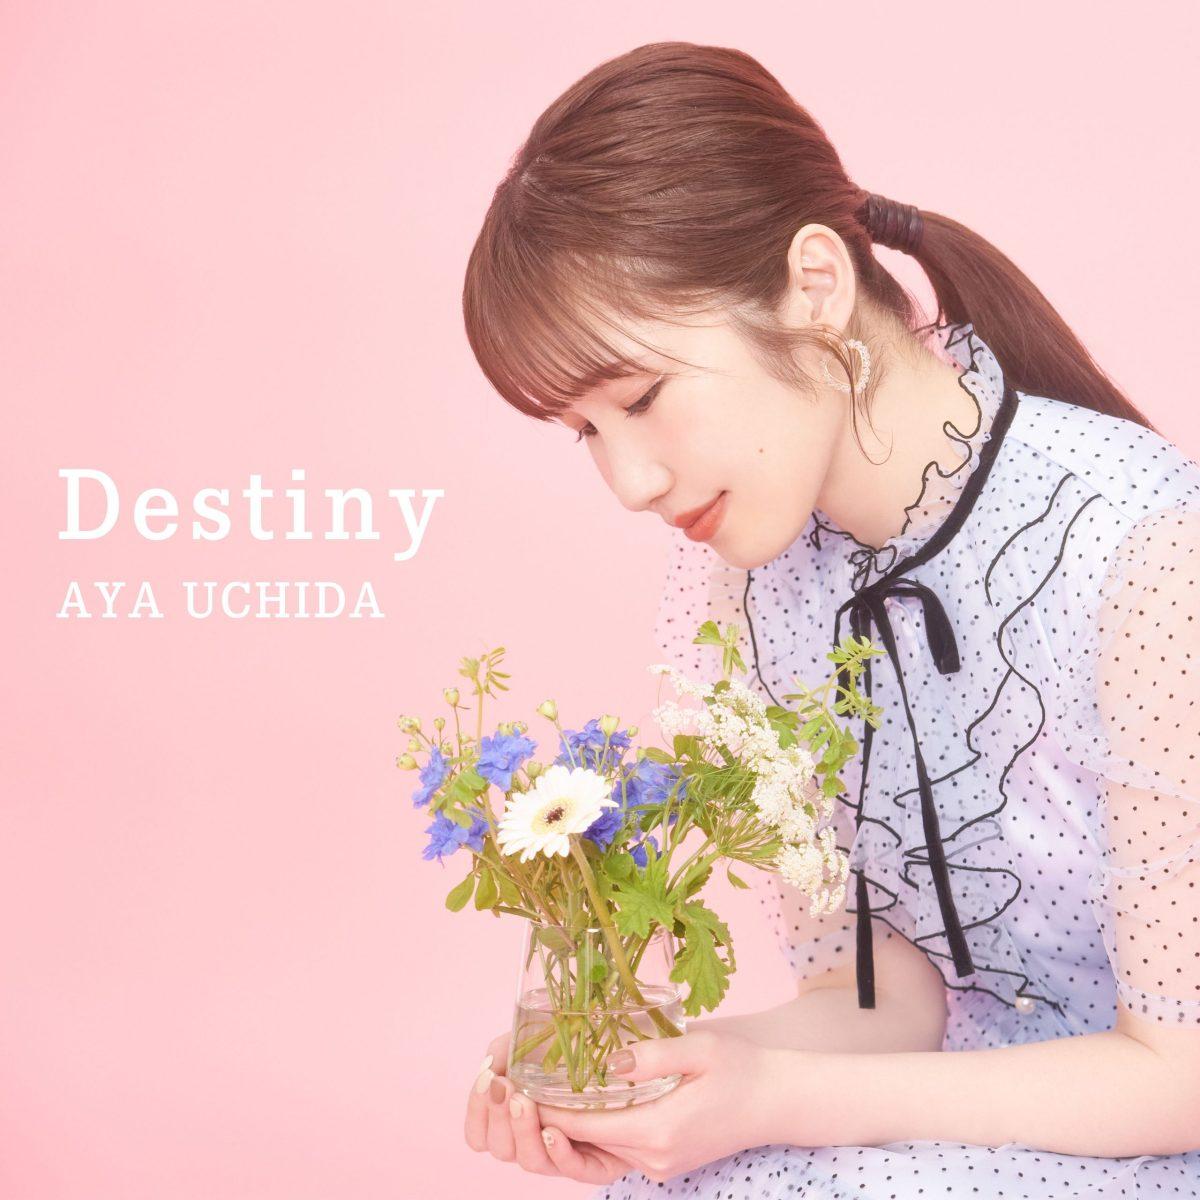 Aya Uchida Destiny 2